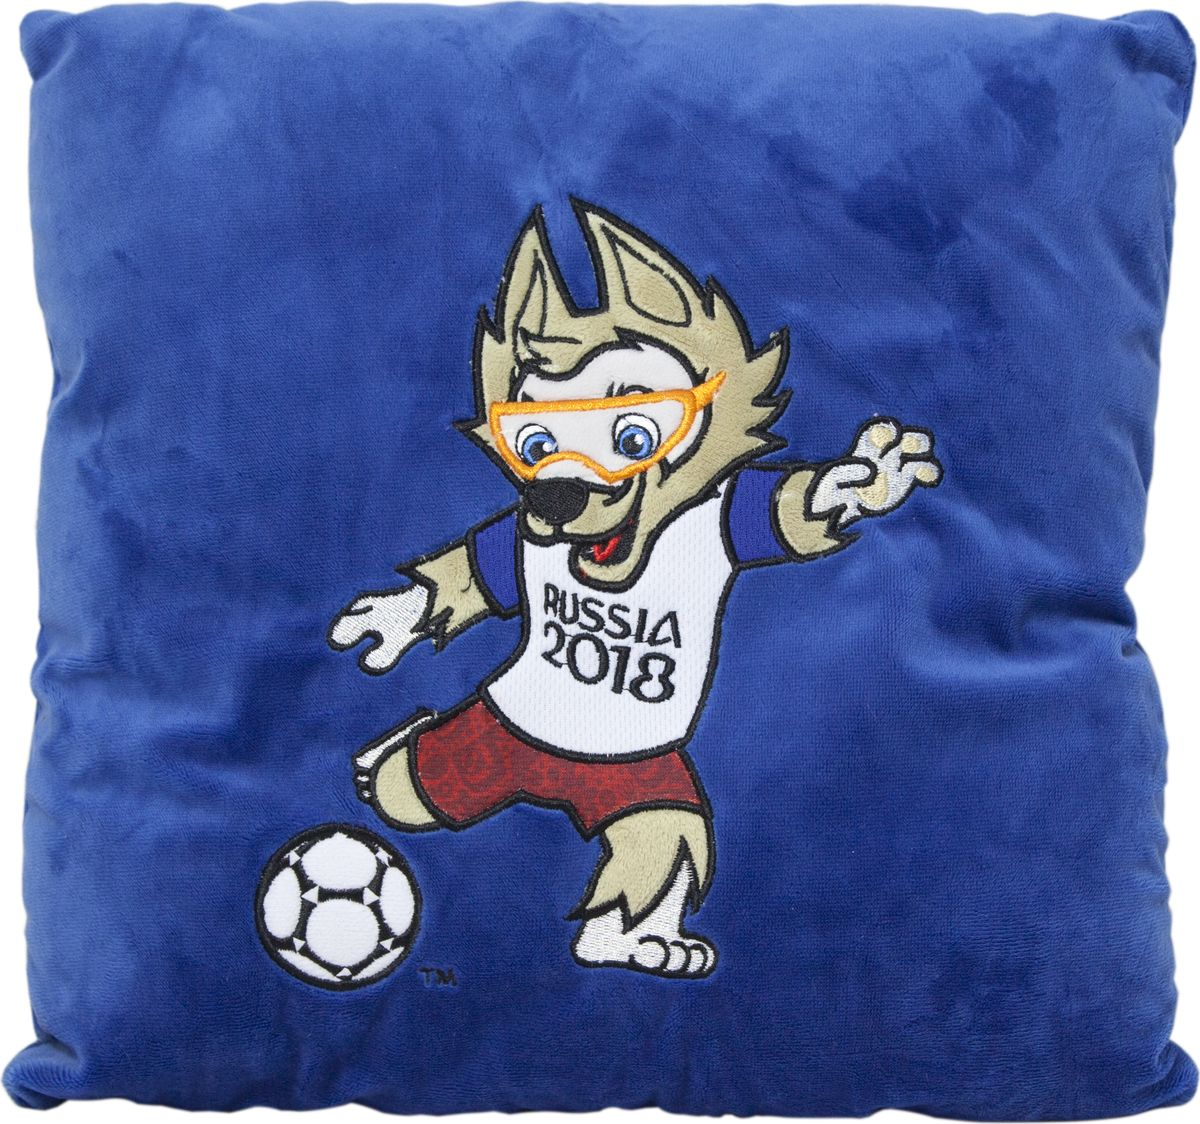 FIFA-2018 Мягкая игрушка-подушка Забивака Kicking 30 х 30 см недорого